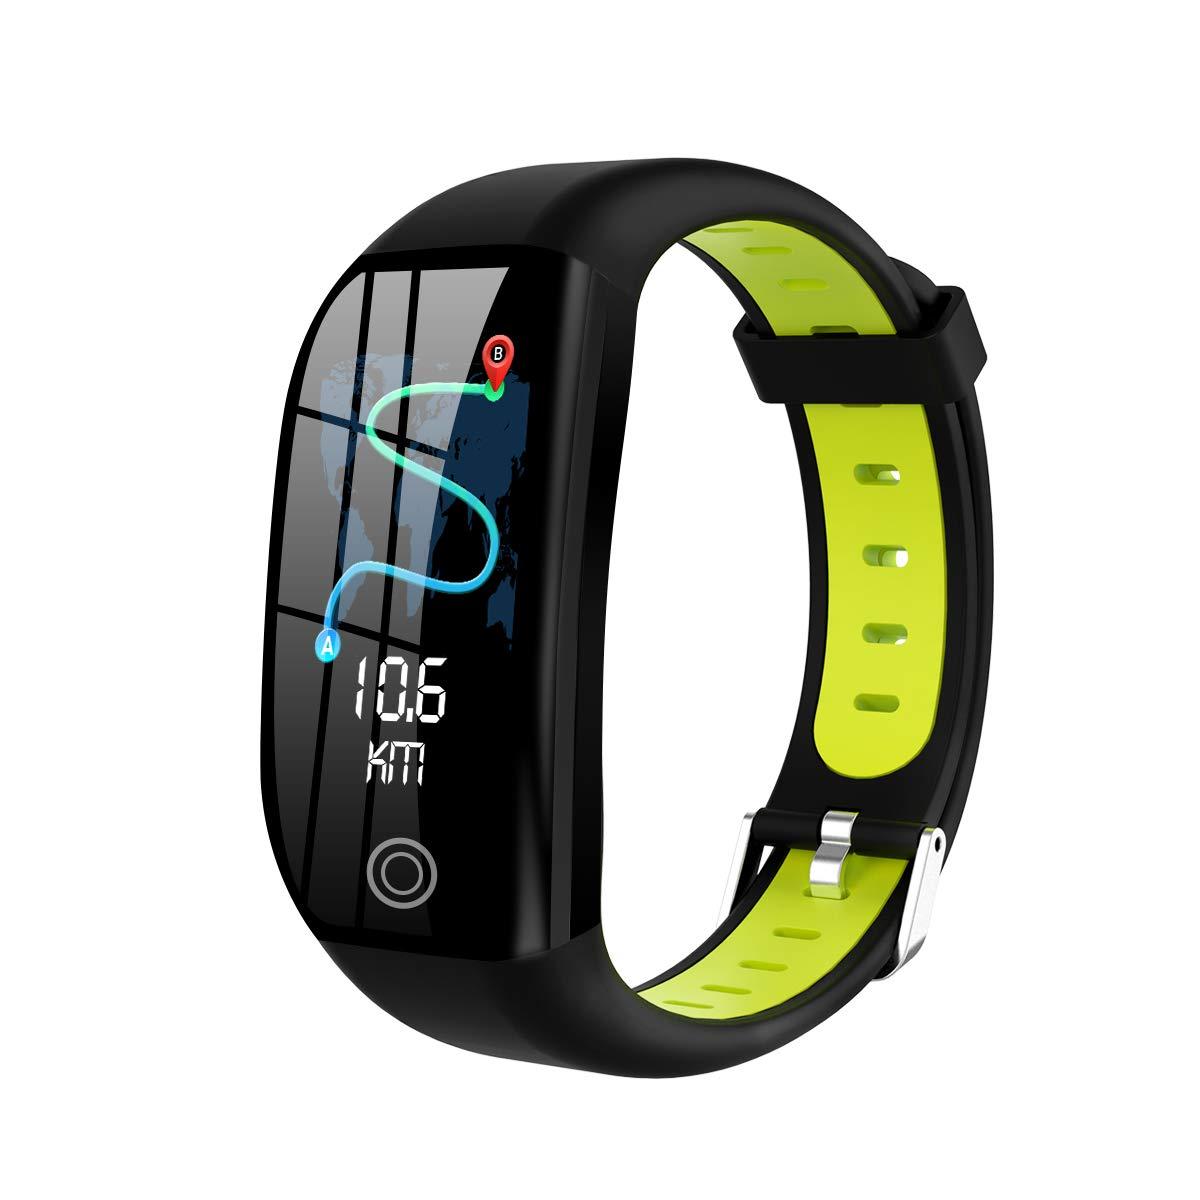 SPORS Waterproof Call Reminder Heart Rate Monitor Watch, Pedometer Sport Smart Watch, Sleep Monitoring Smart Bracelet-Green by SPORS